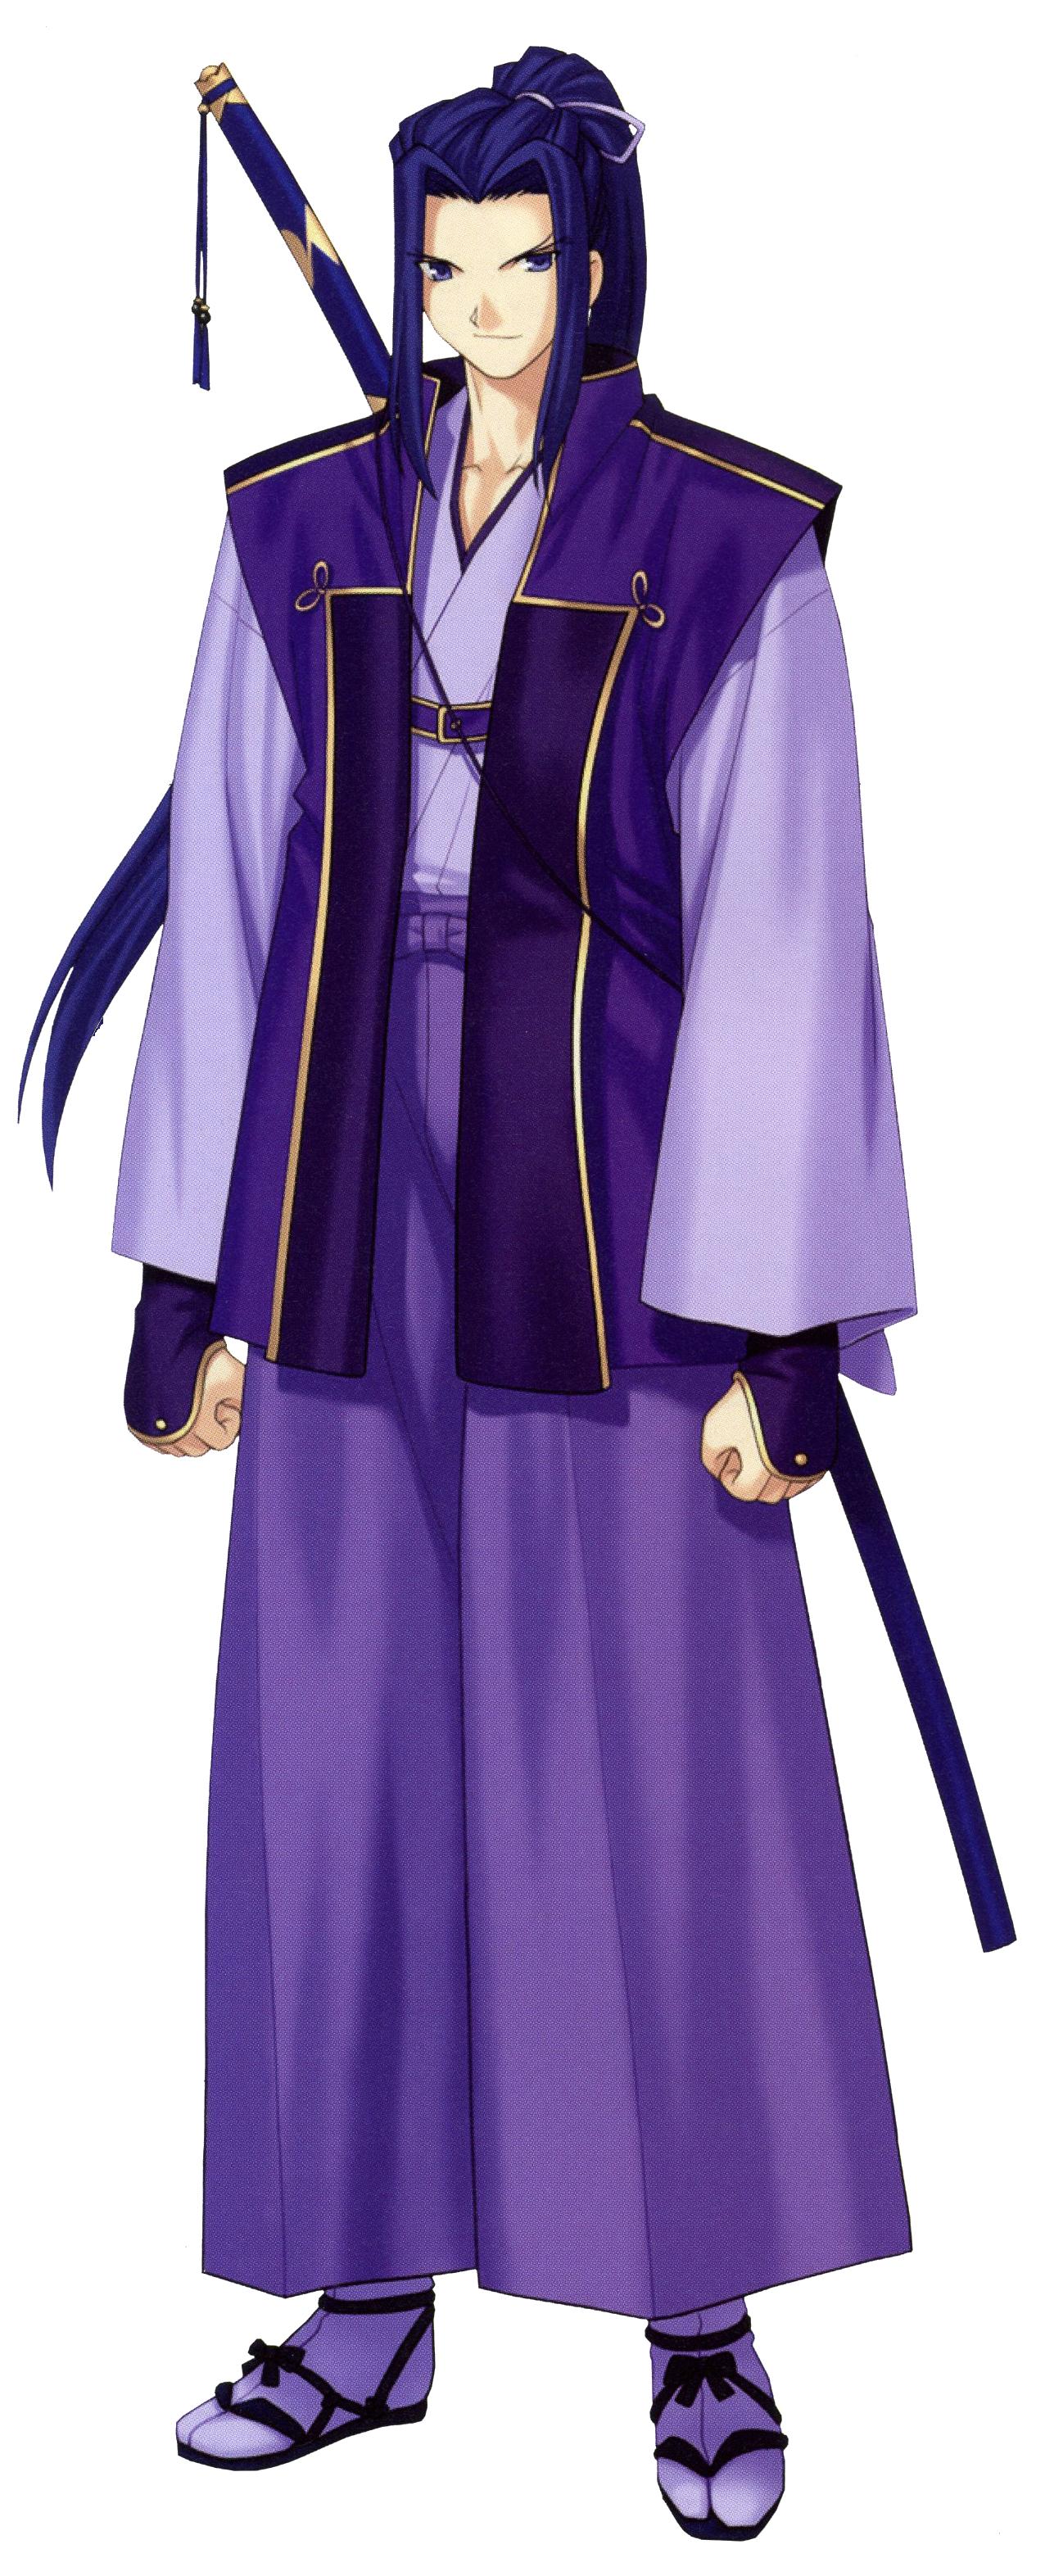 Assassin Fate Stay Night Type Moon Wiki Fandom Powered By Wikia Lanccelot Watch Aegis Of Attilia